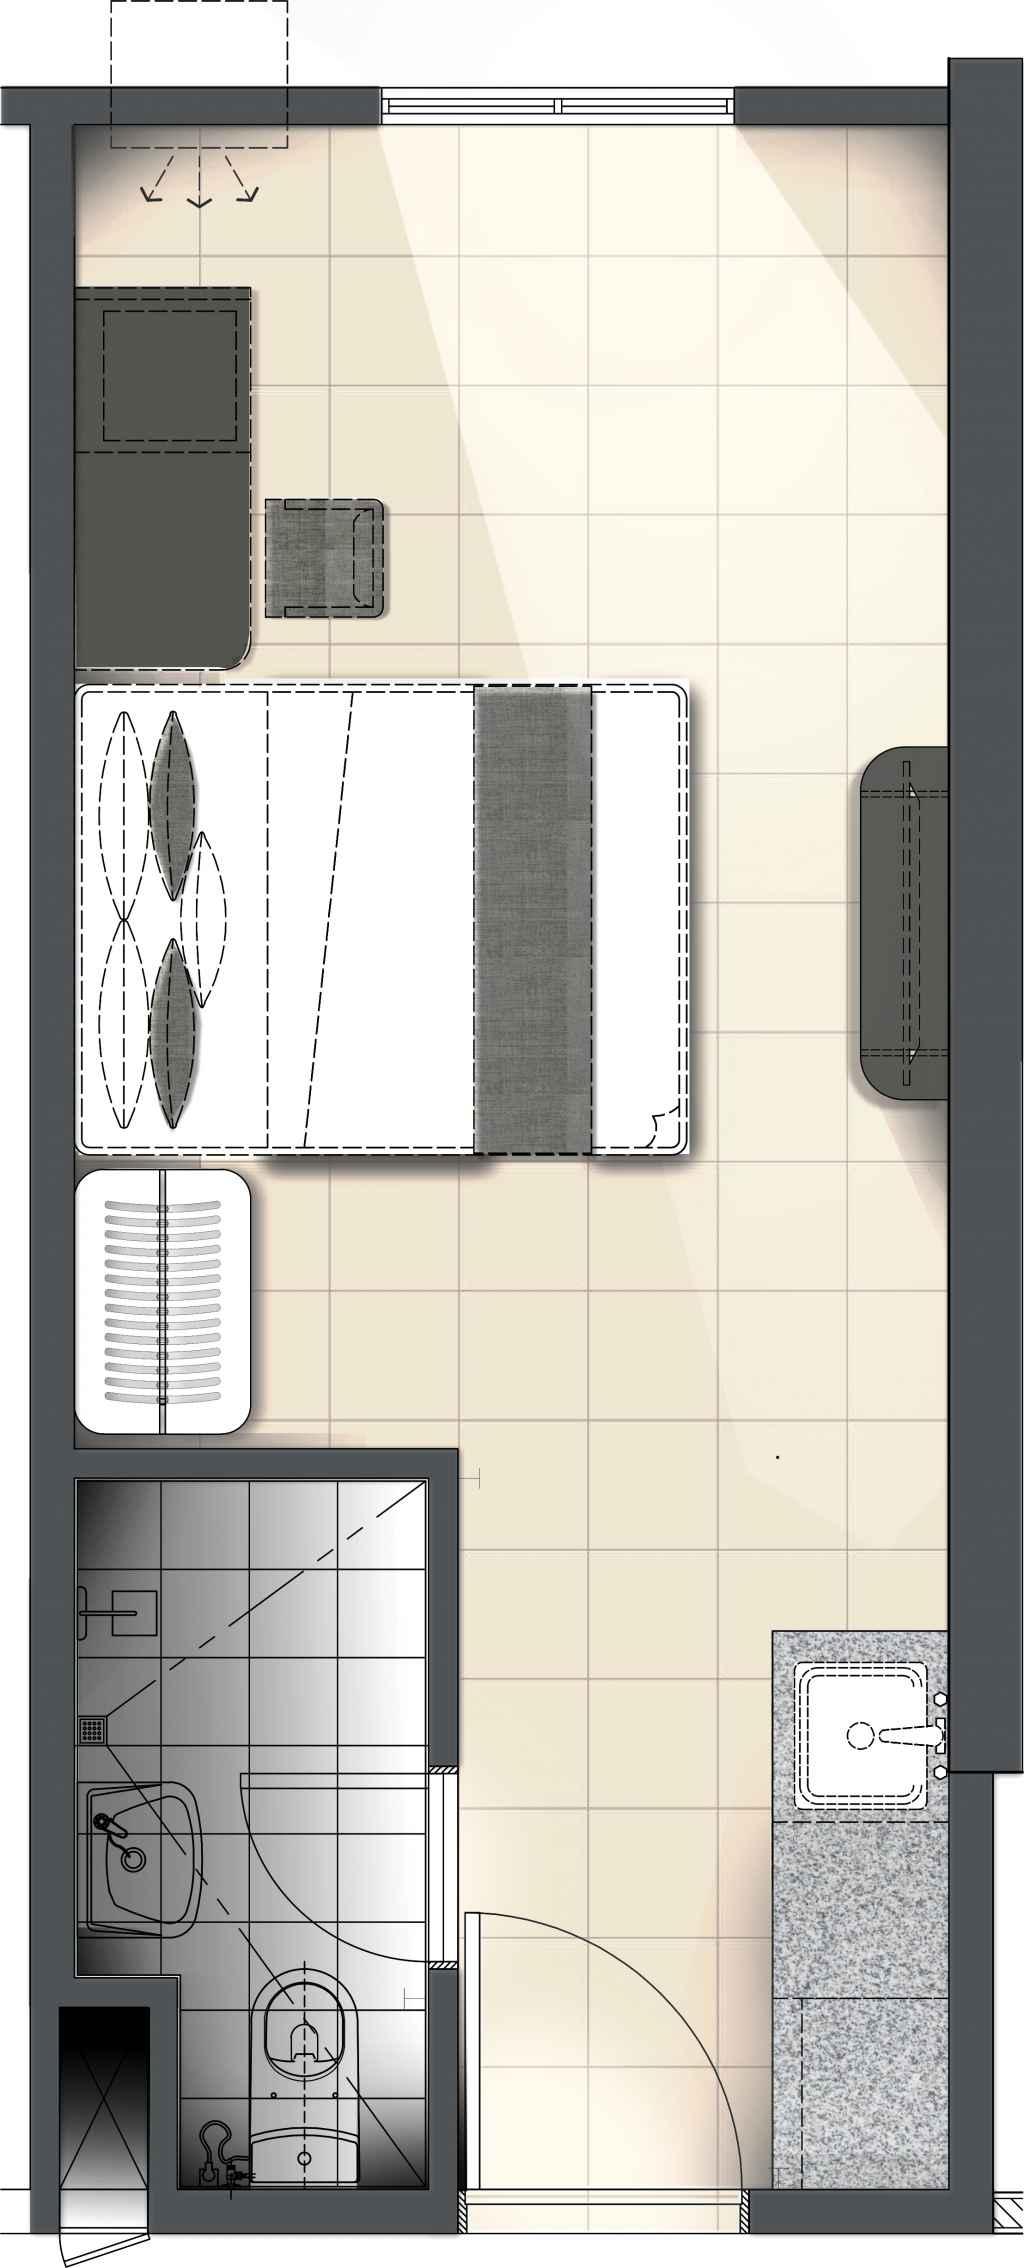 Torre Lorenzo - The Suites at TLM - Studio Unit